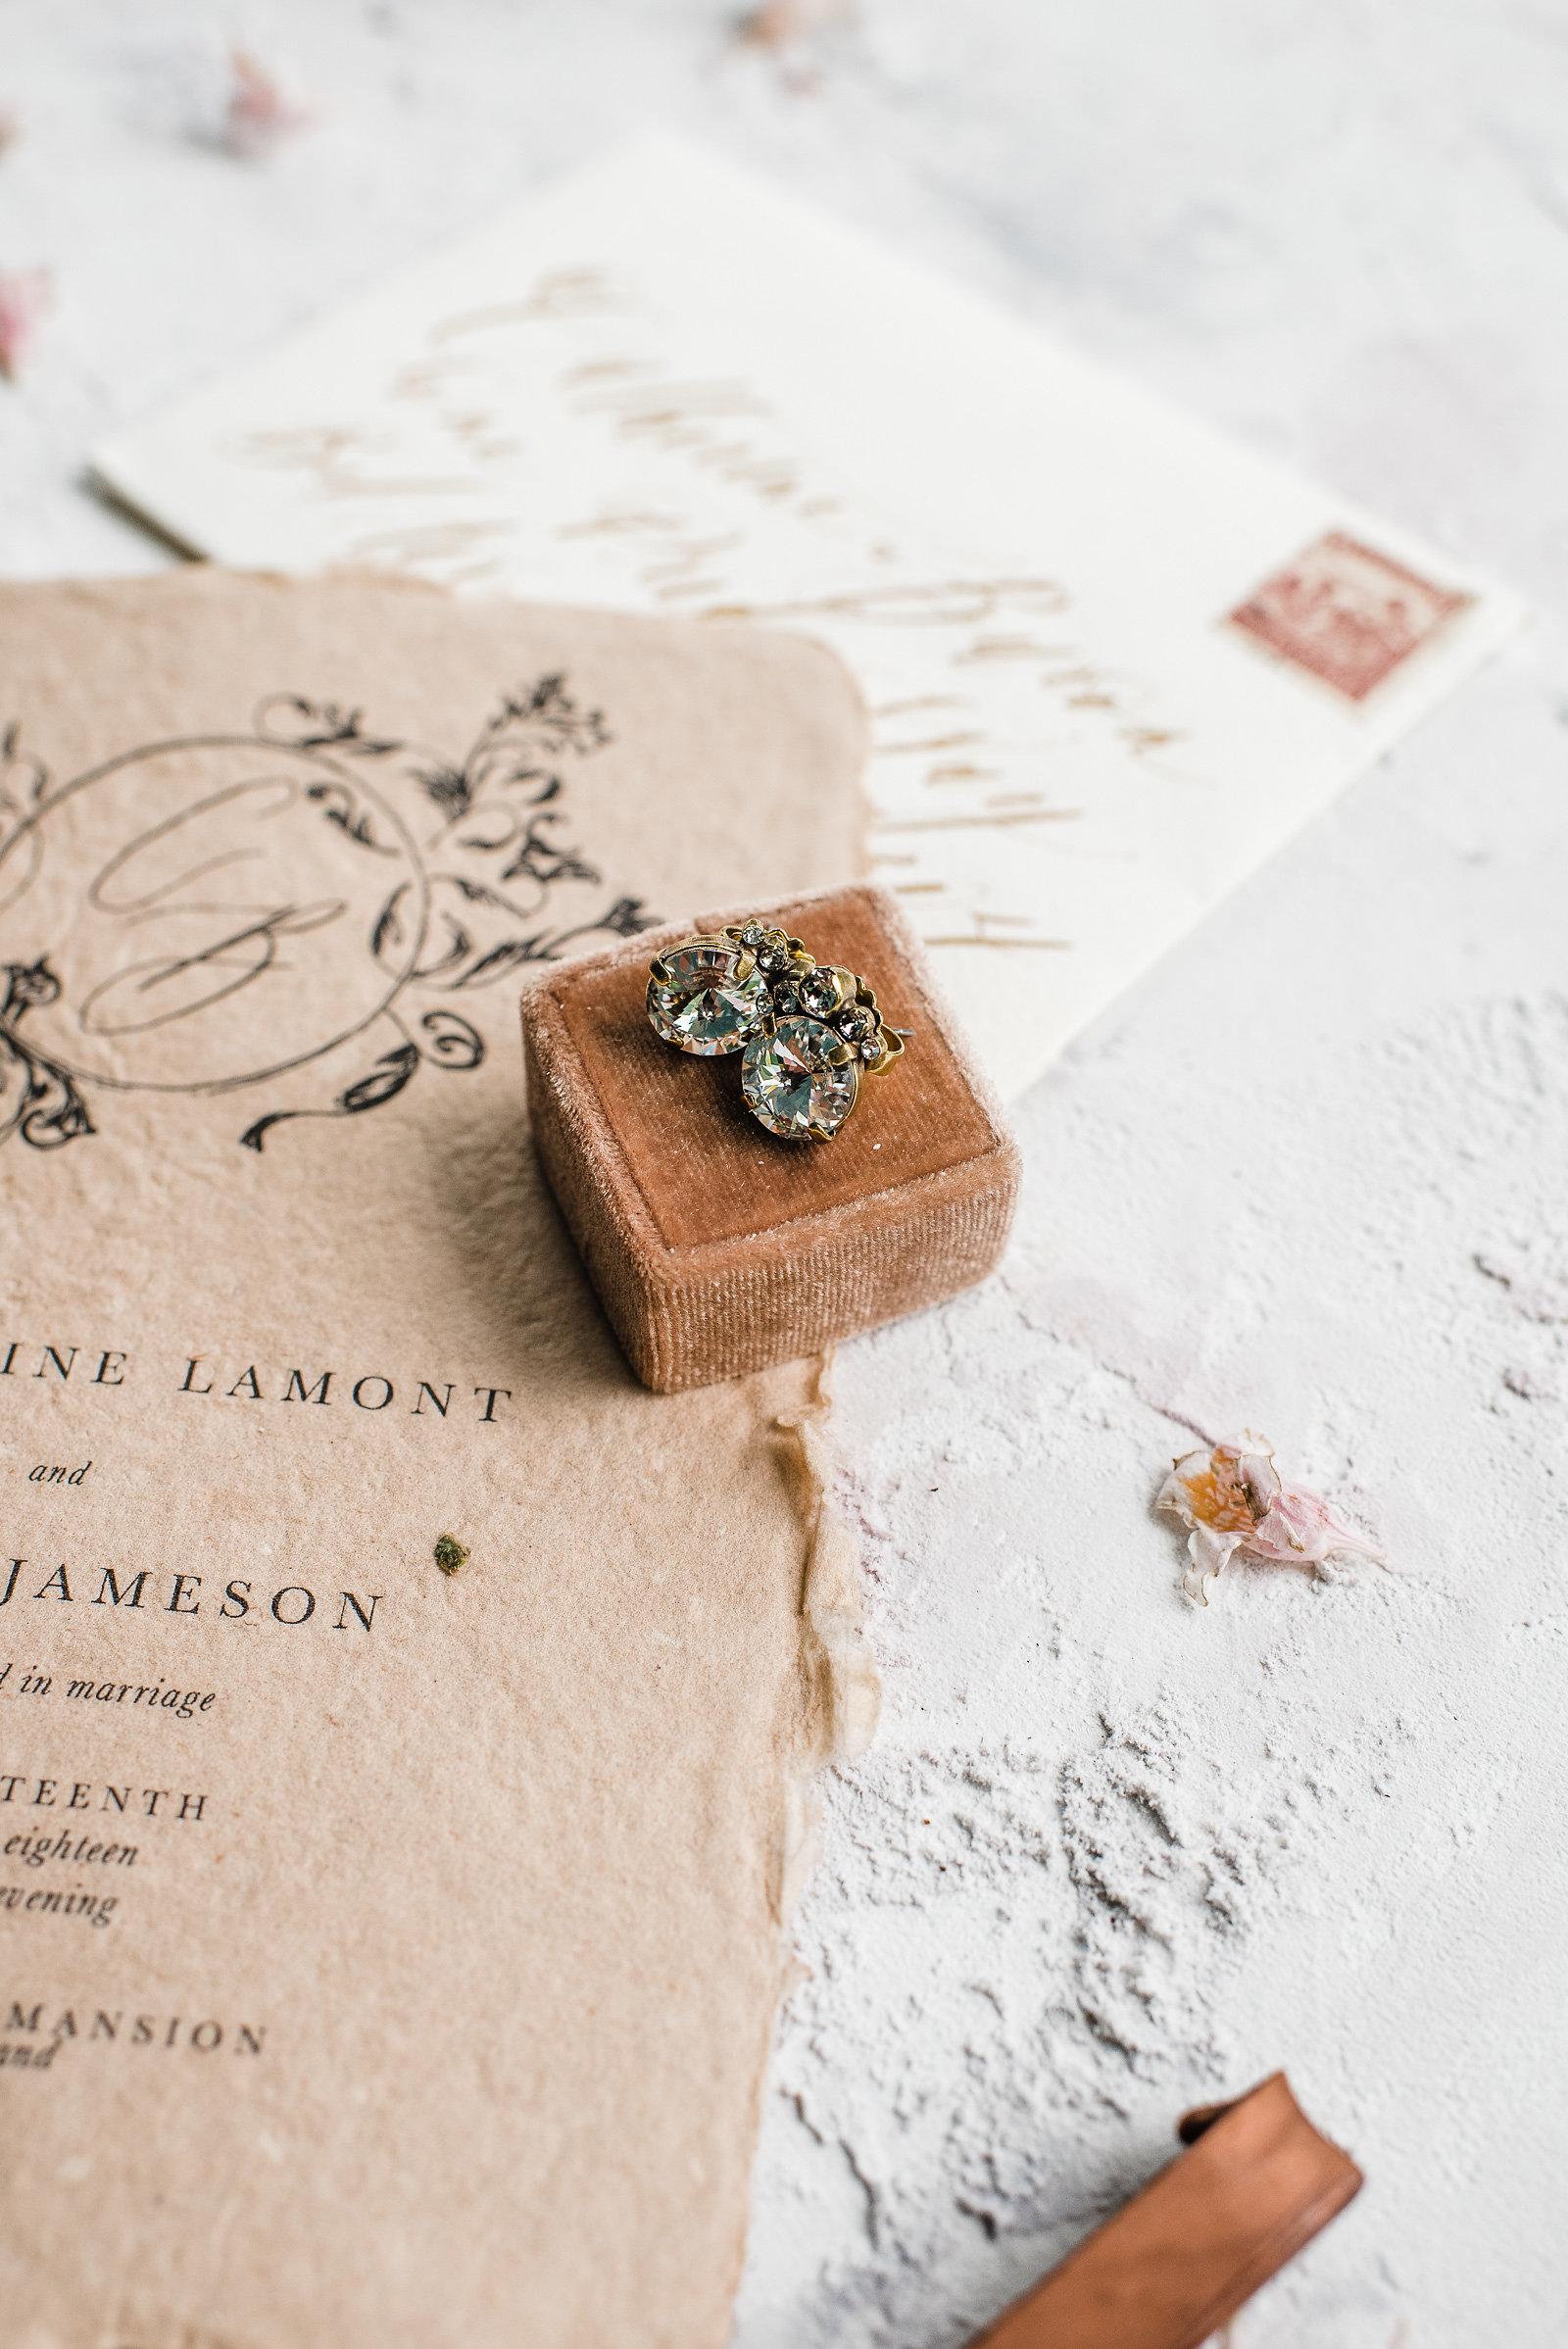 Semi Custom Calligraphy Wedding Invitations | Shotgunning for Love Letters, Baltimore, MD